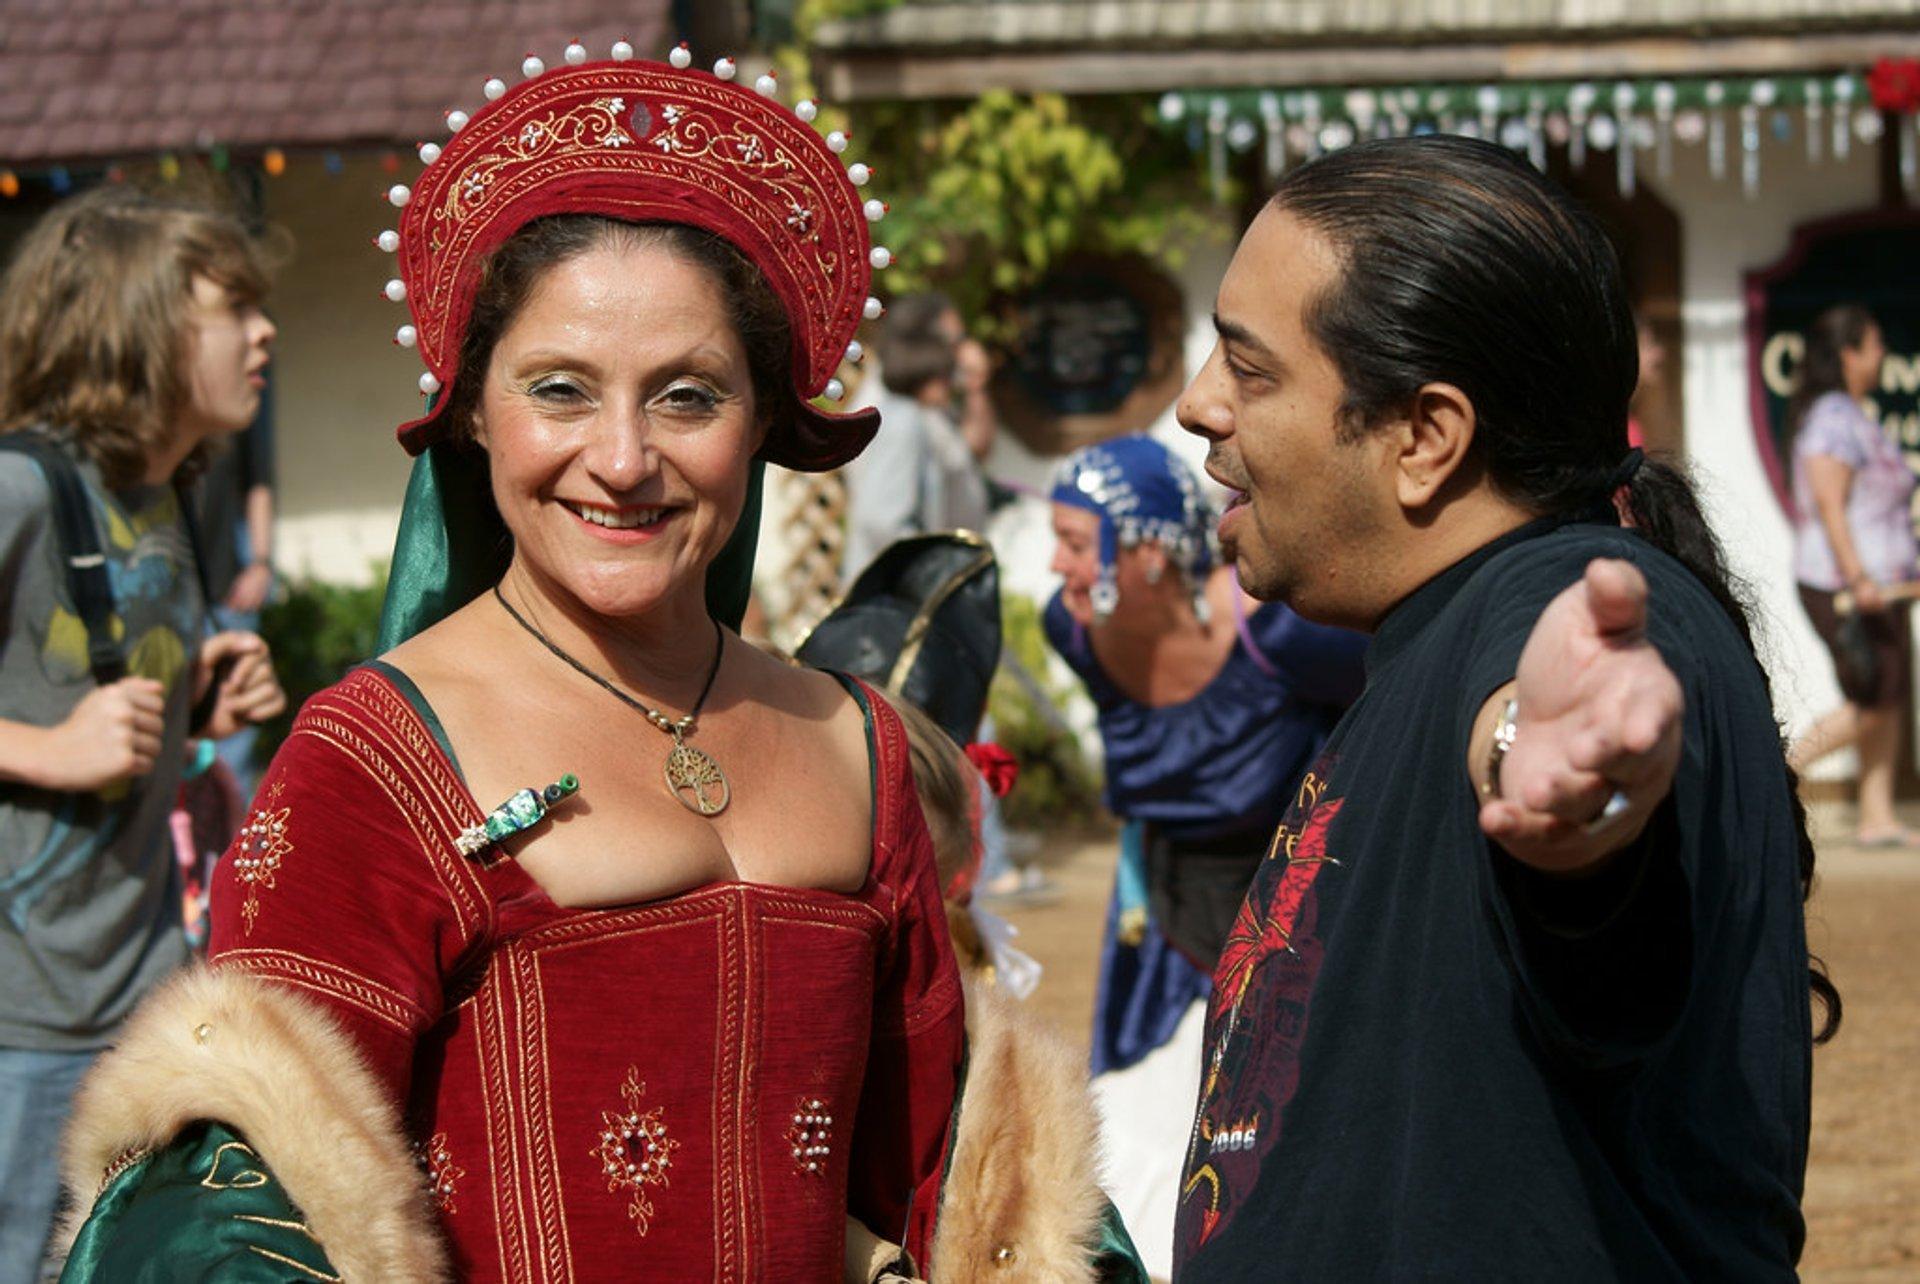 Texas Renaissance Festival in Texas - Best Season